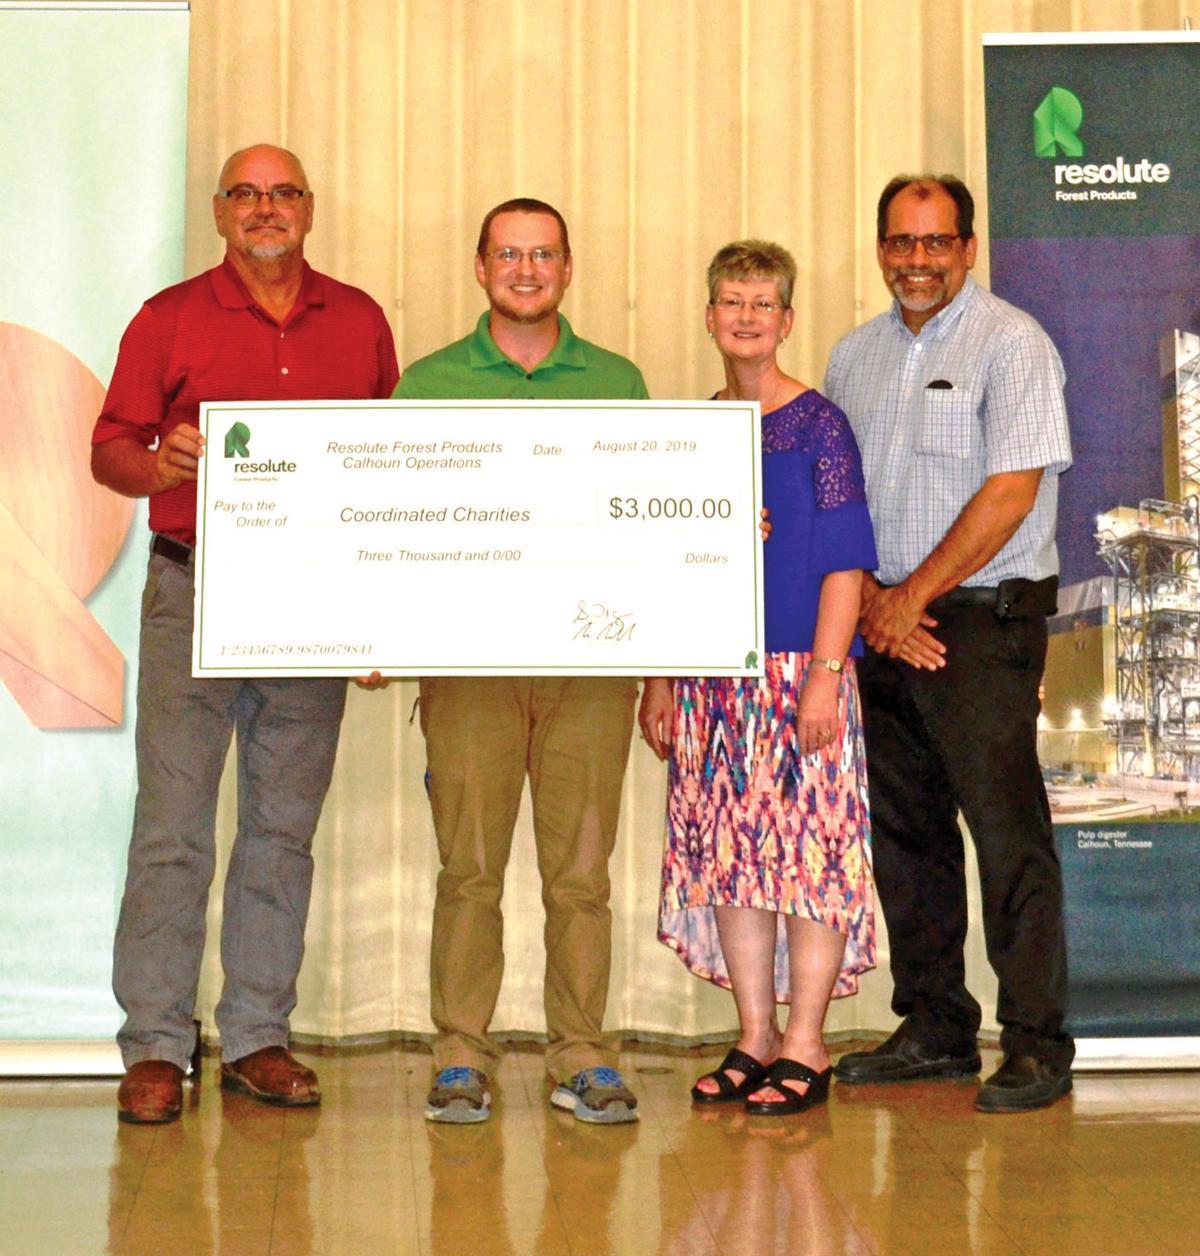 Resolute donates to area charities